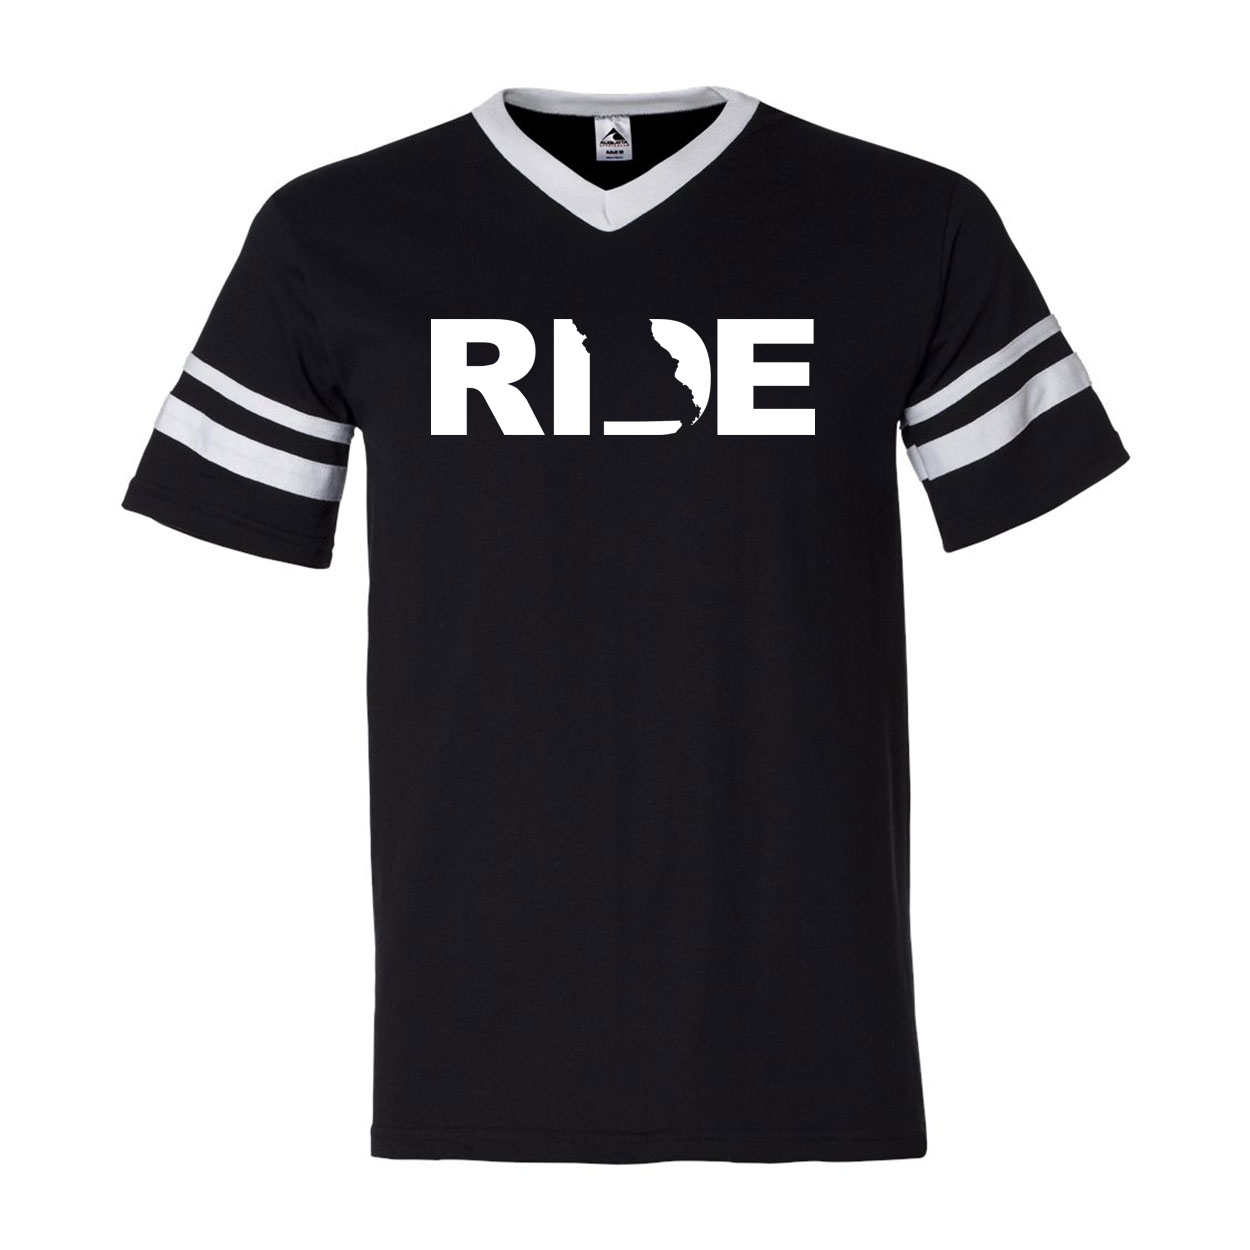 Ride Missouri Classic Premium Striped Jersey T-Shirt Black/White (White Logo)